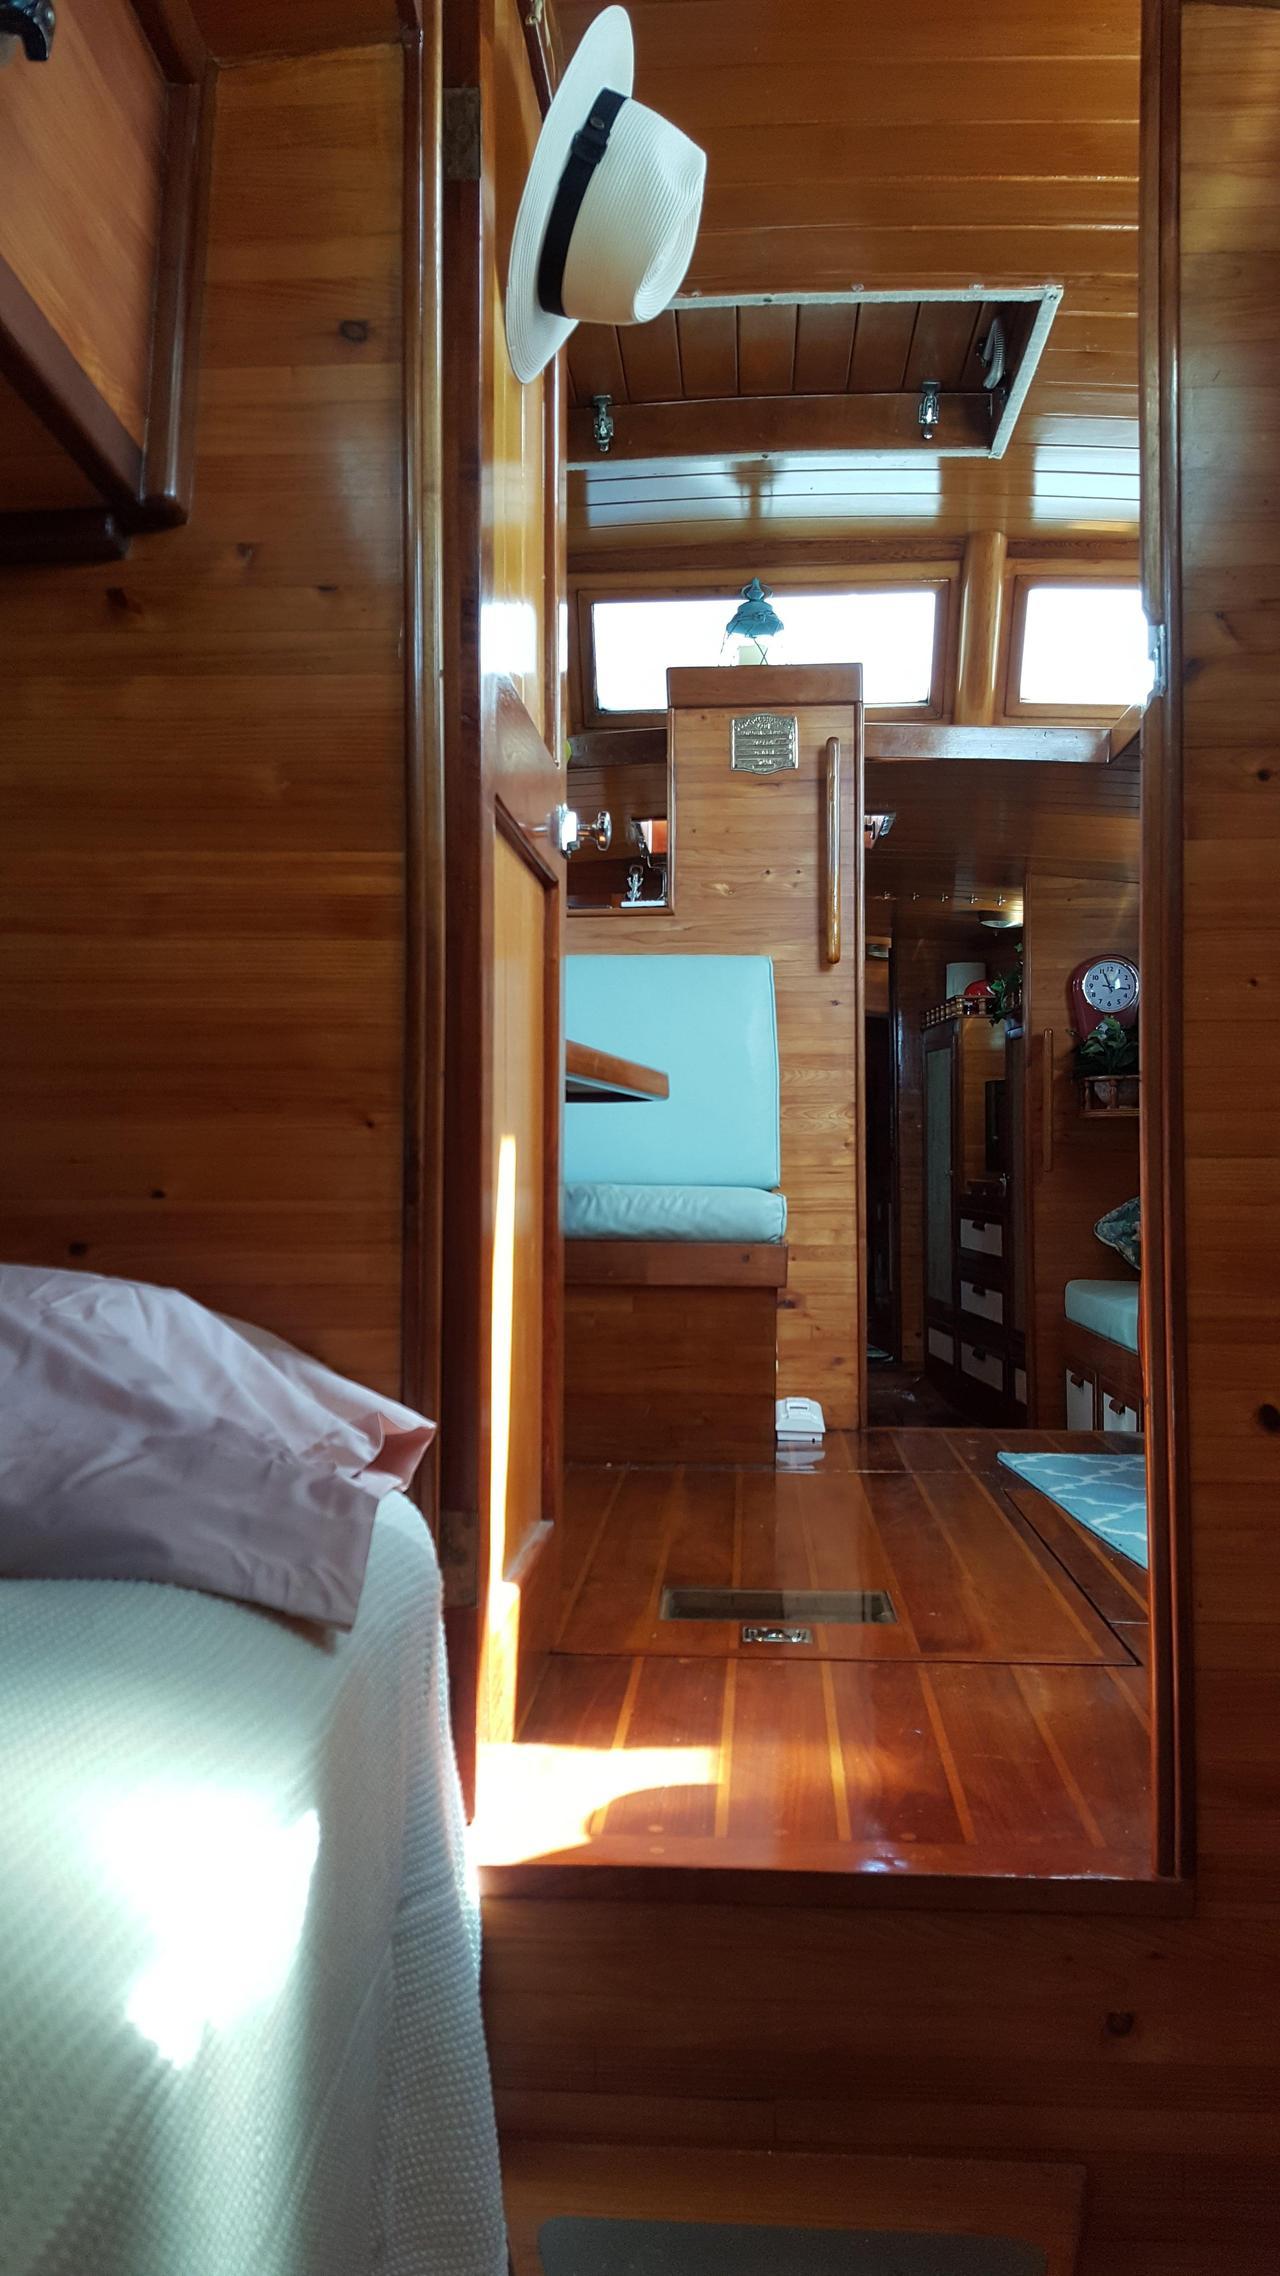 1993 Used Custom Chuck Paine Cruiser Sailboat For Sale - $170,000